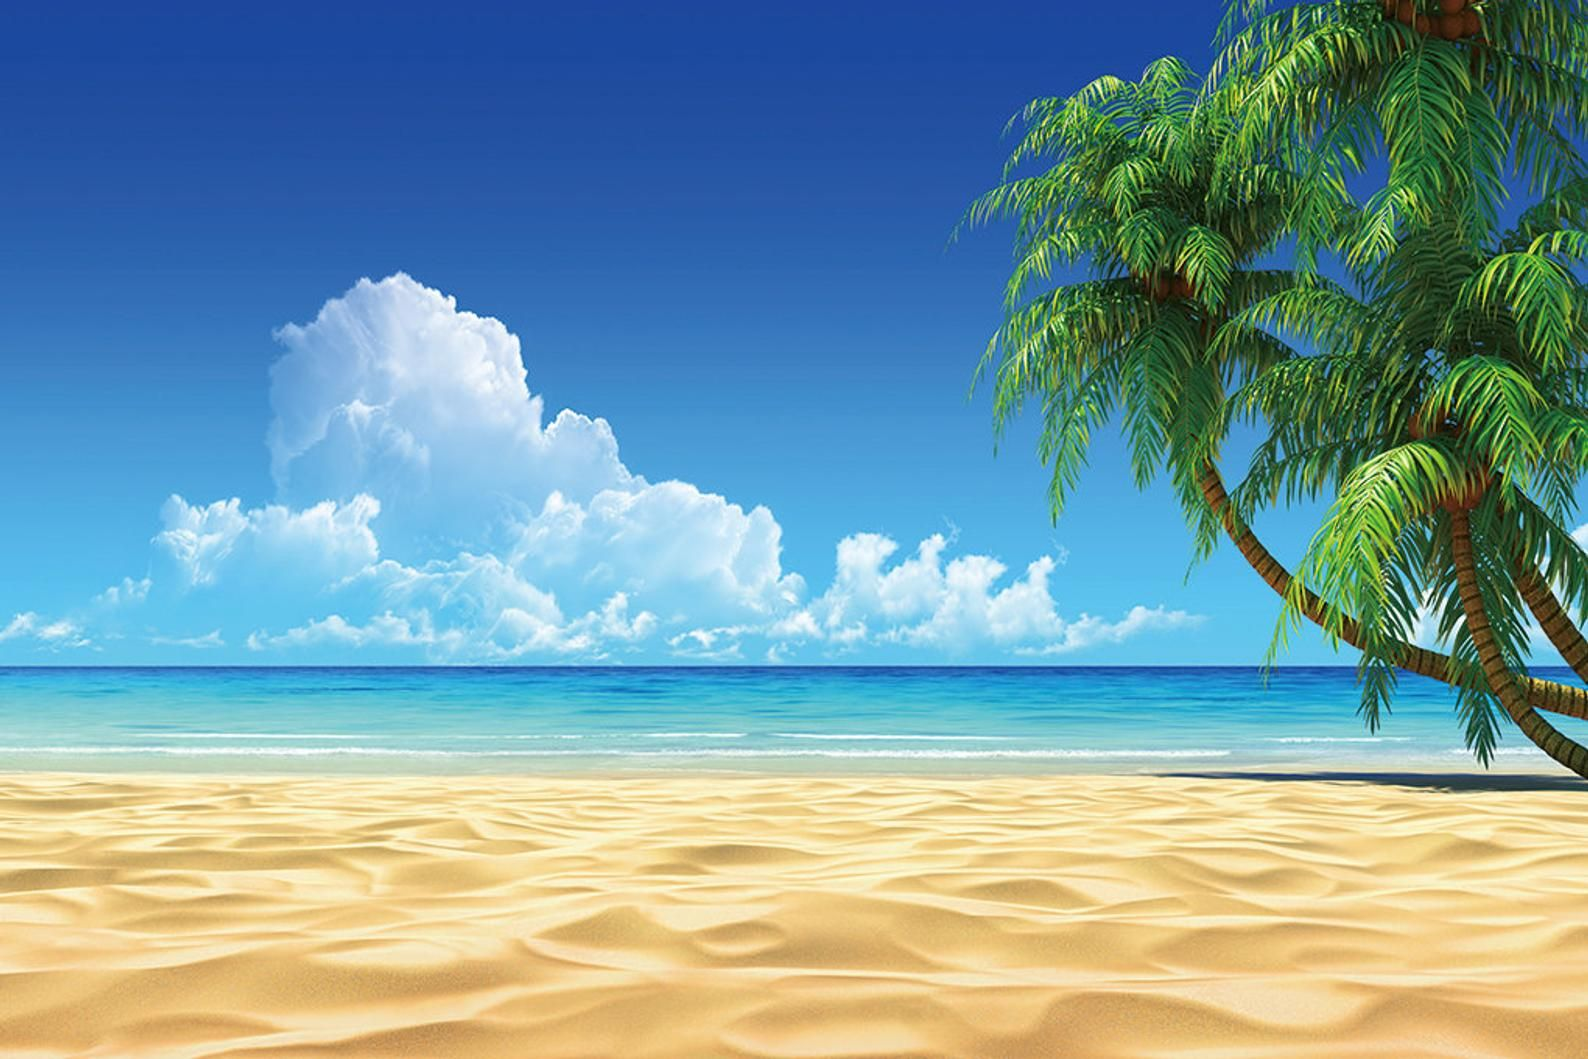 Custom E54 Wall Mural Diy Sunny Beach Wall Decor Impress Your Etsy In 2021 Beach Wallpaper Beach Desktop Backgrounds Beach Background